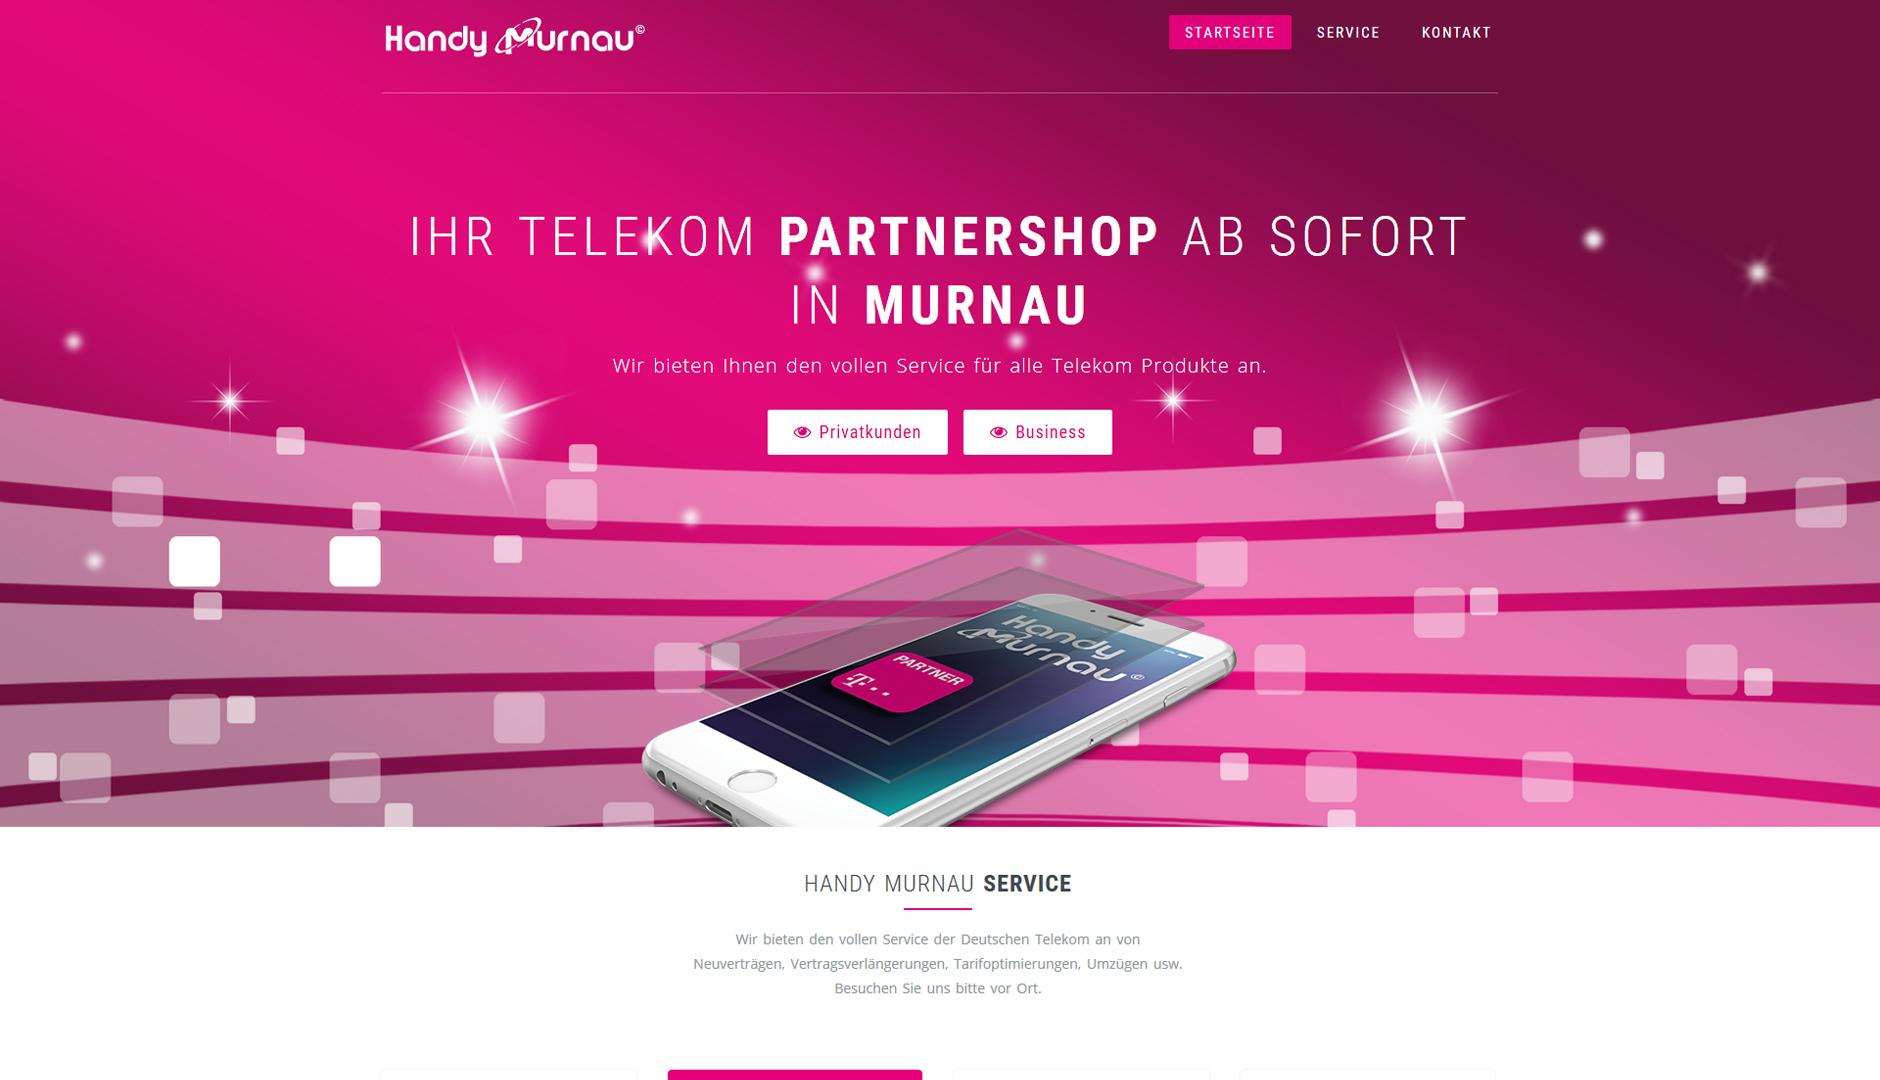 Handy Murnau - Telekom Partner Shop